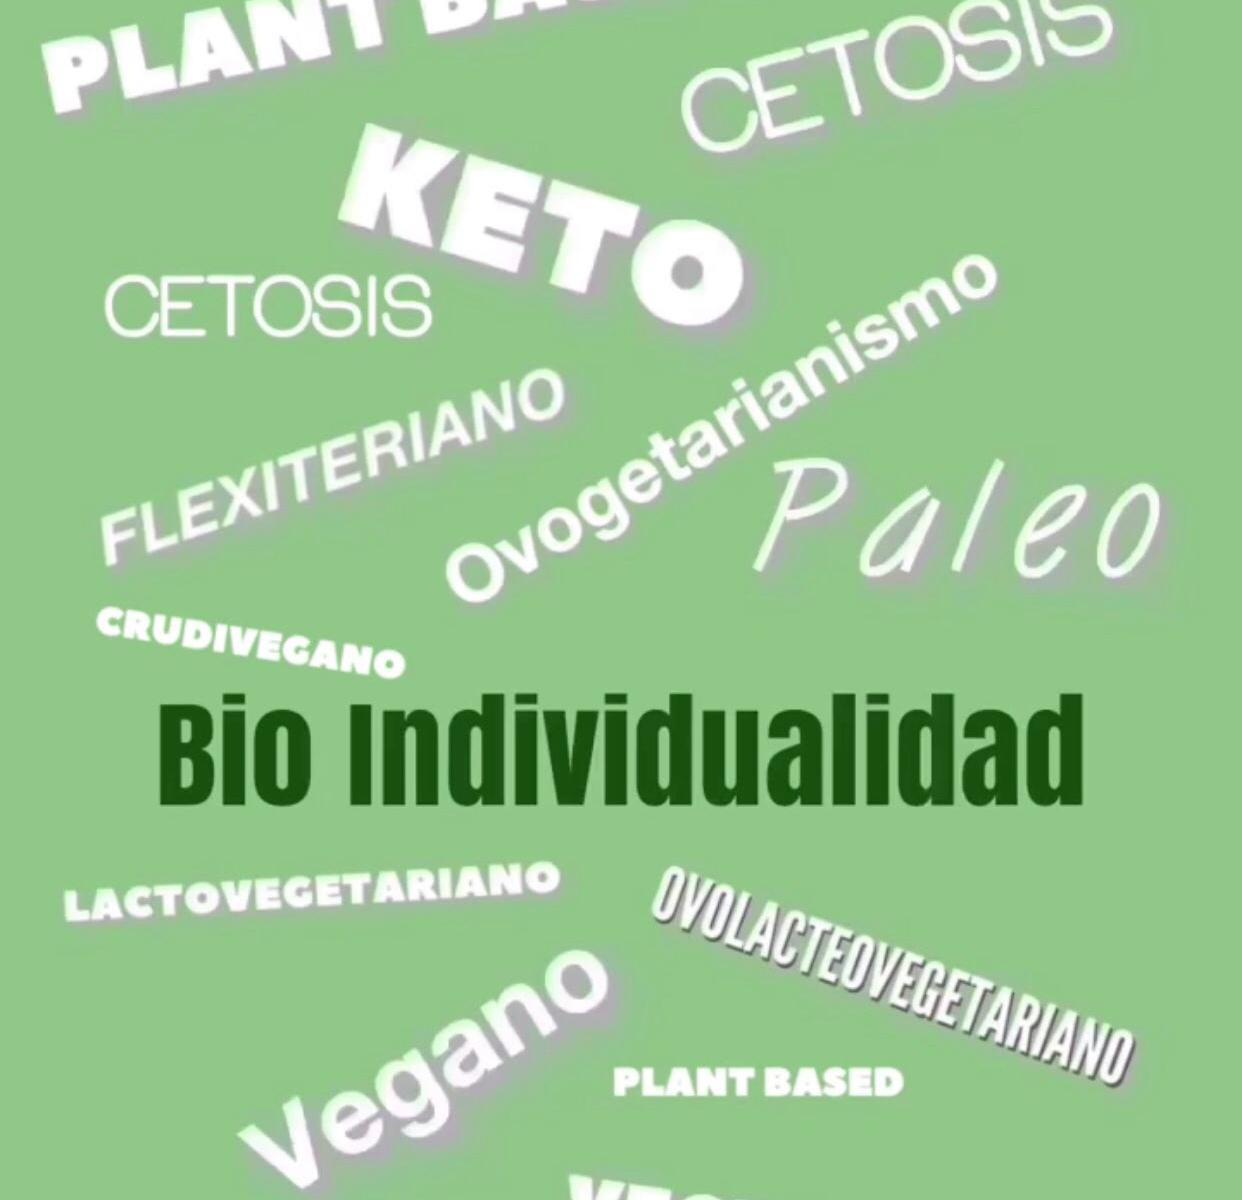 Bio individualidad